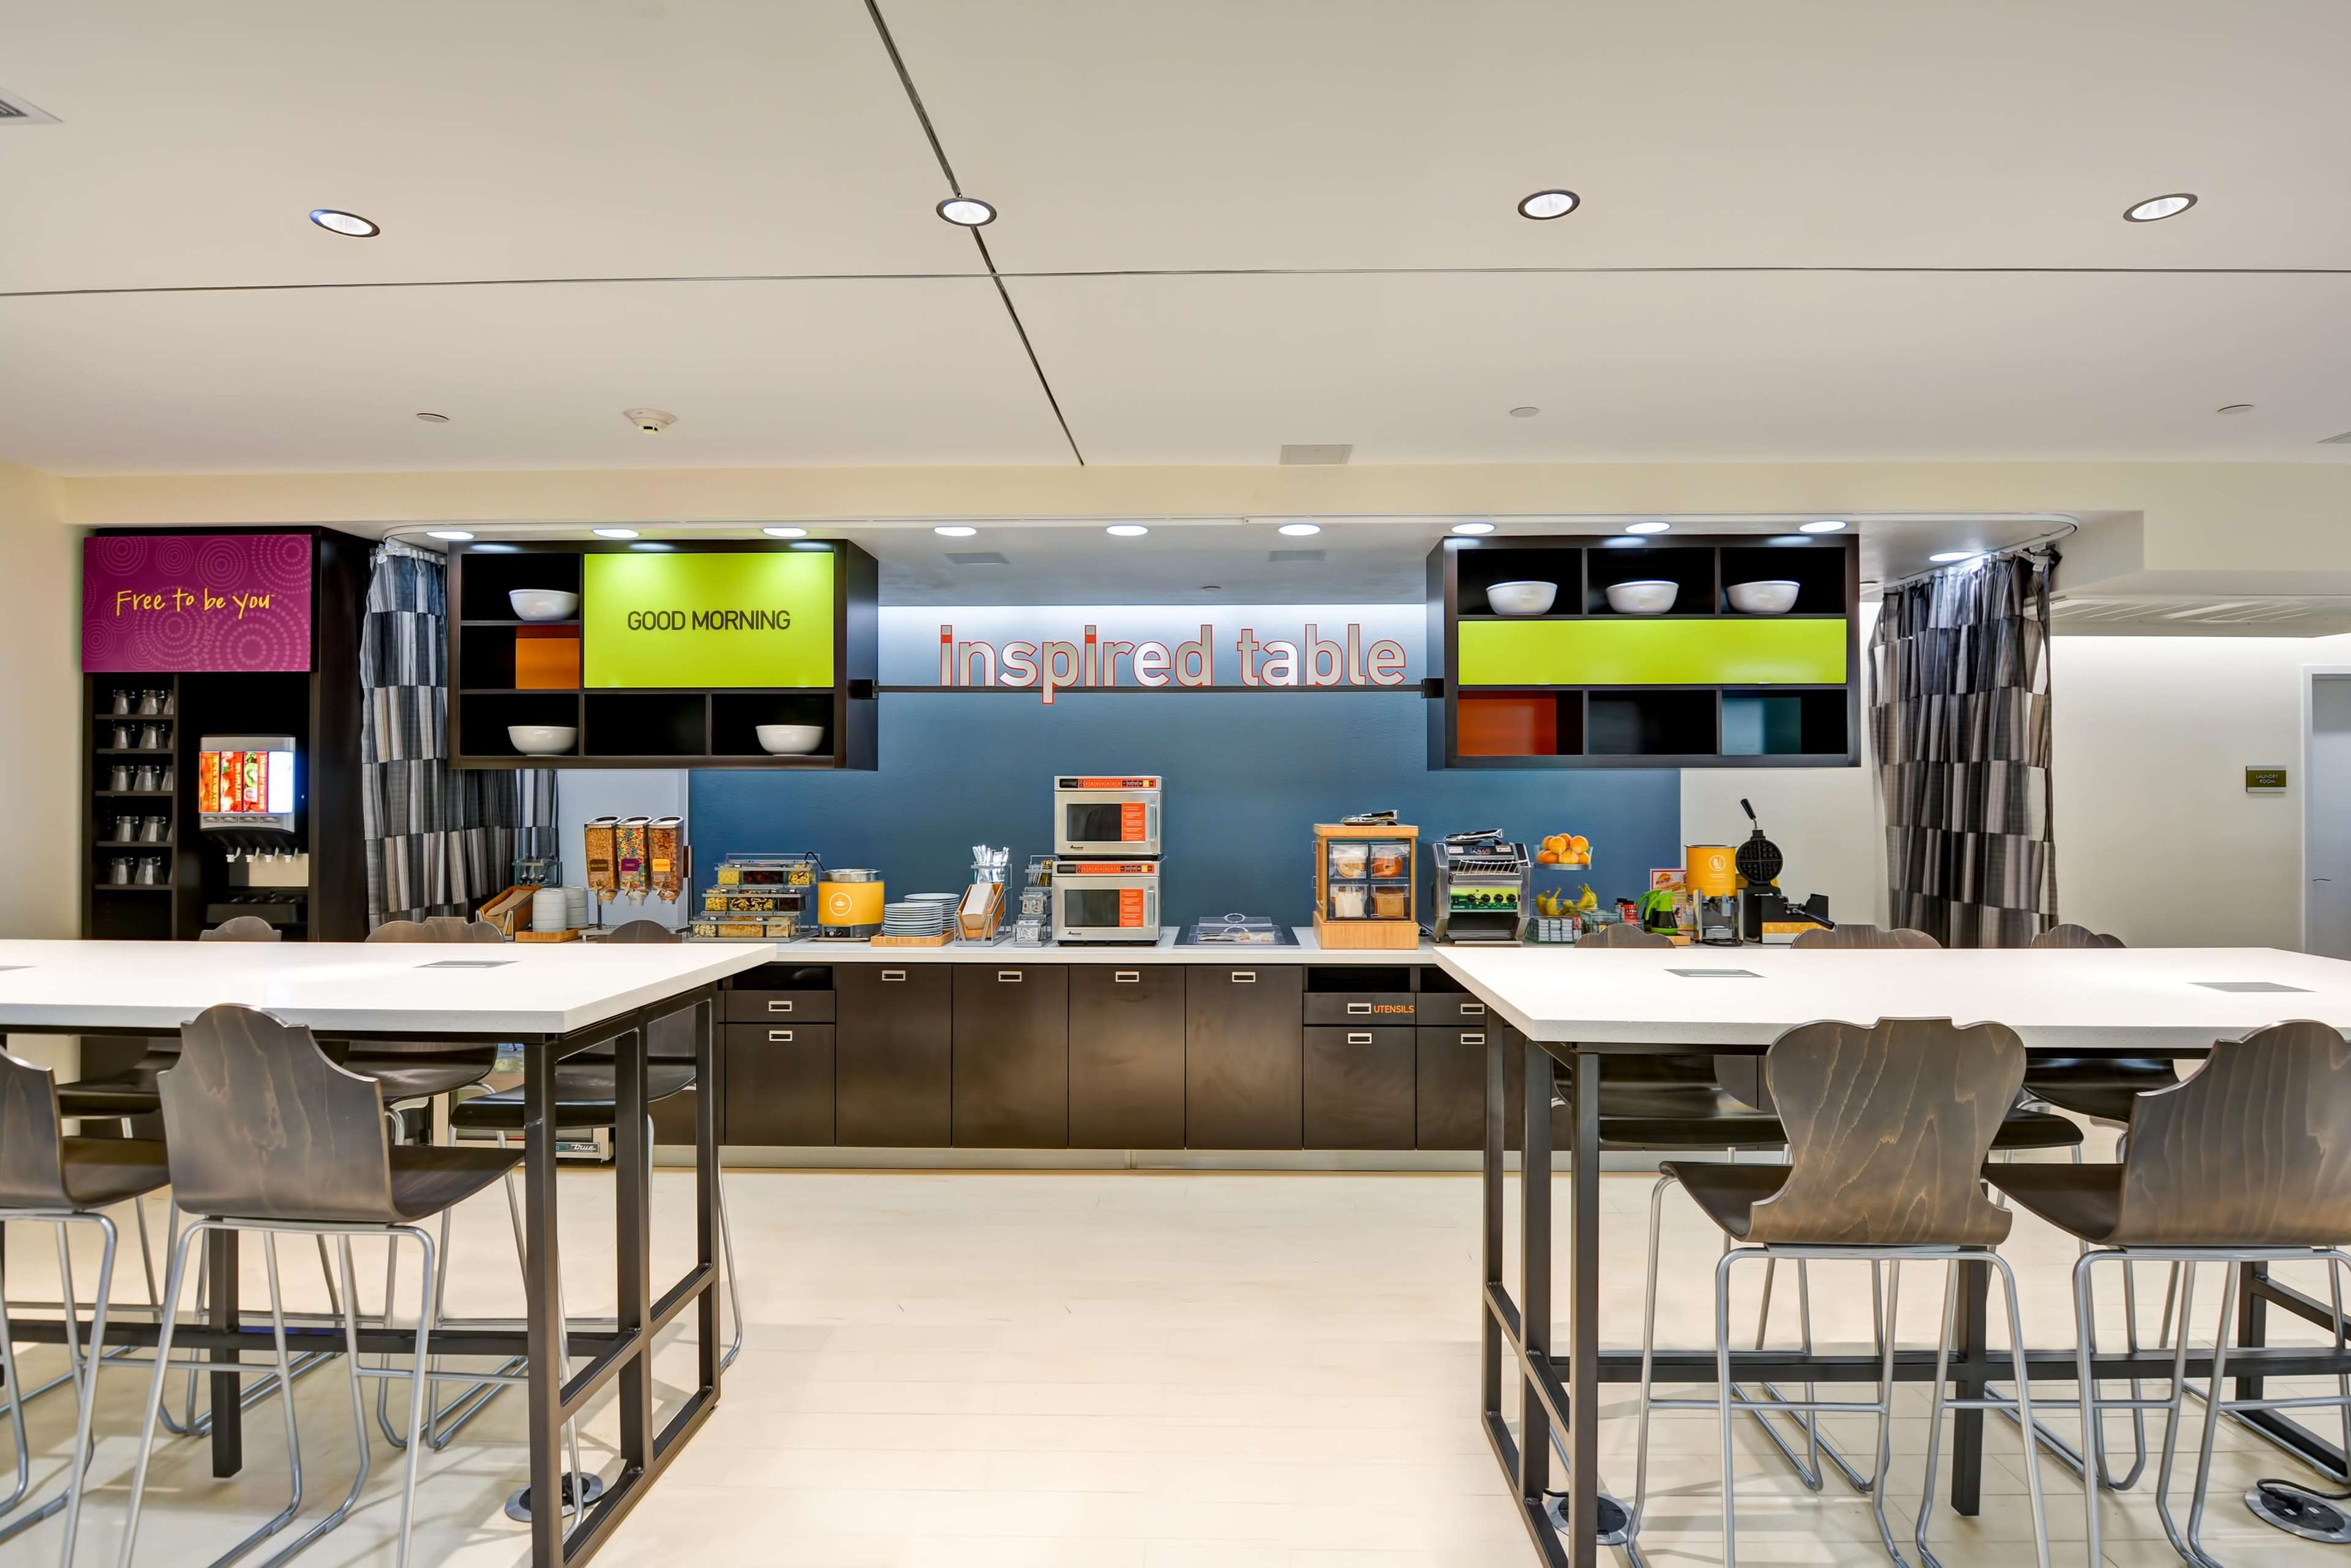 Home2 Suites by Hilton Azusa image 3